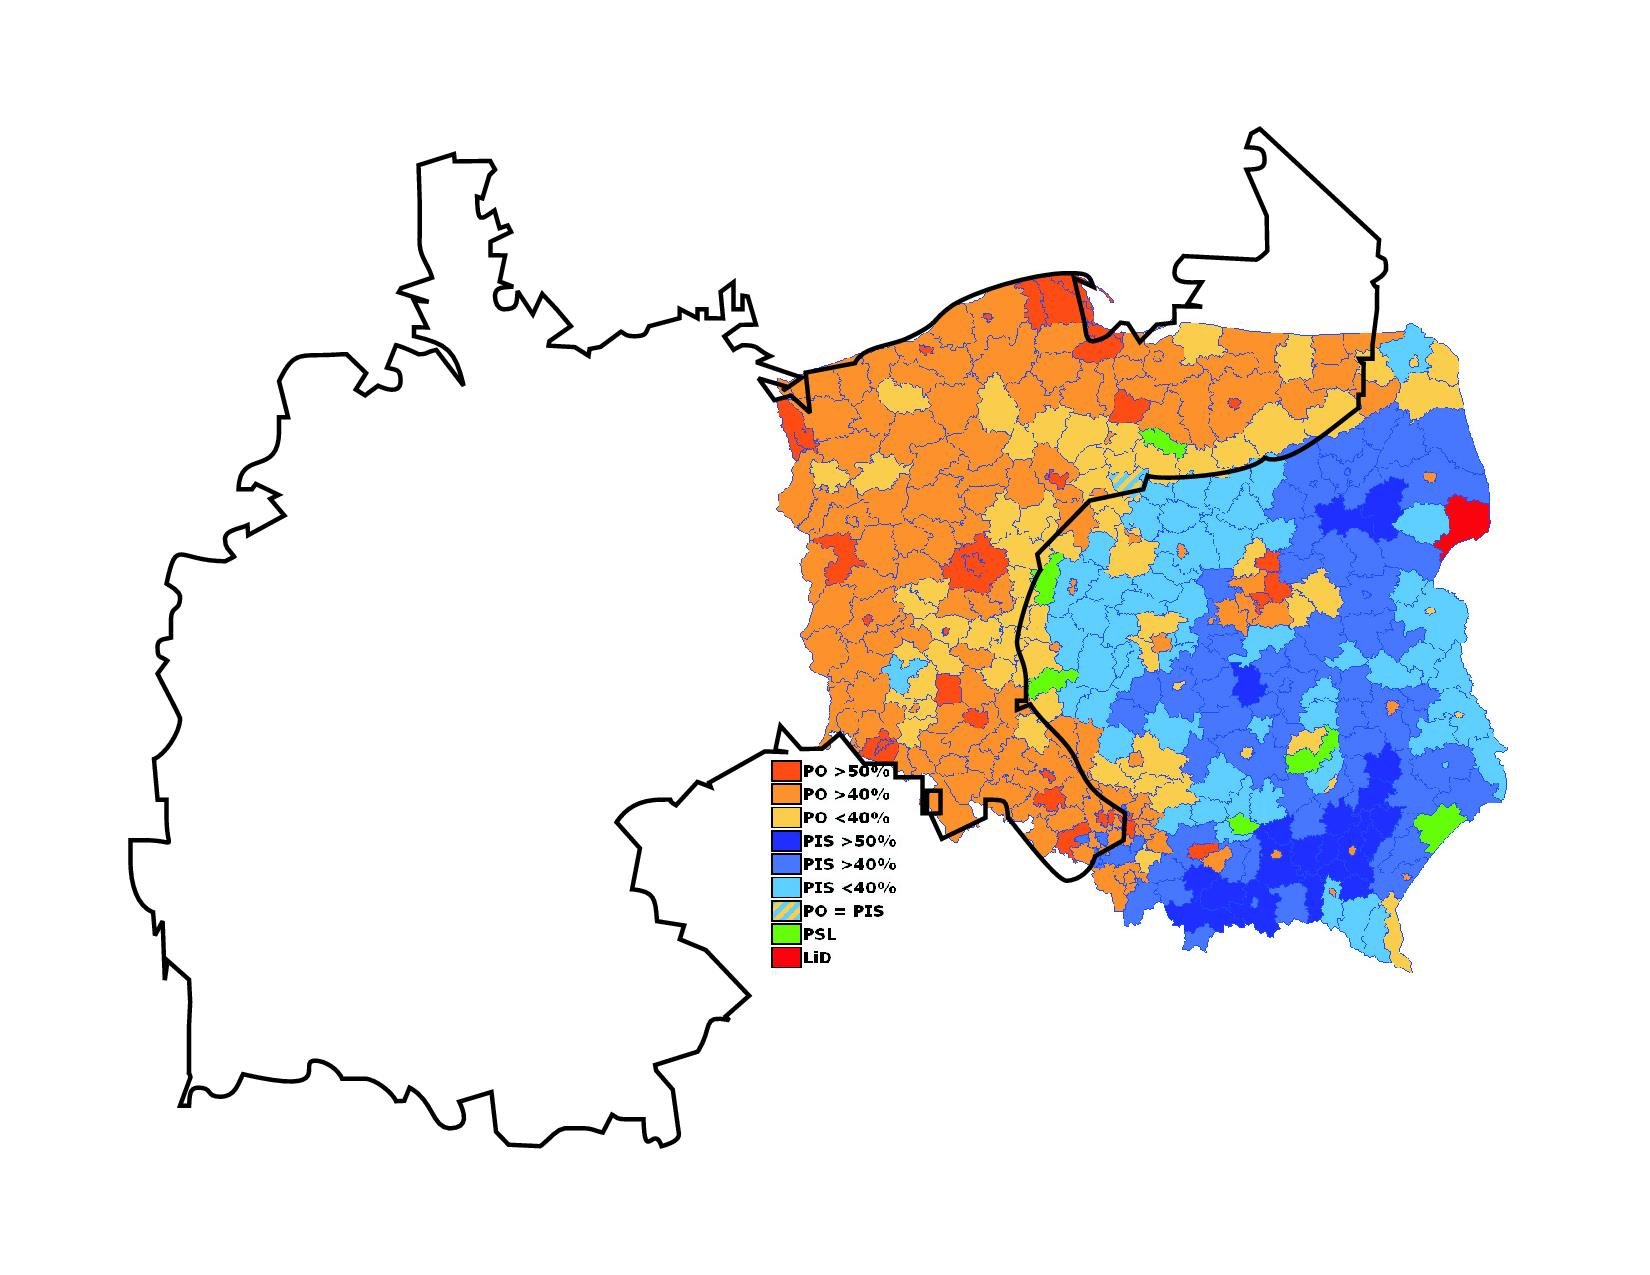 Polands Stark Electoral Divide GeoCurrents - Poland political map